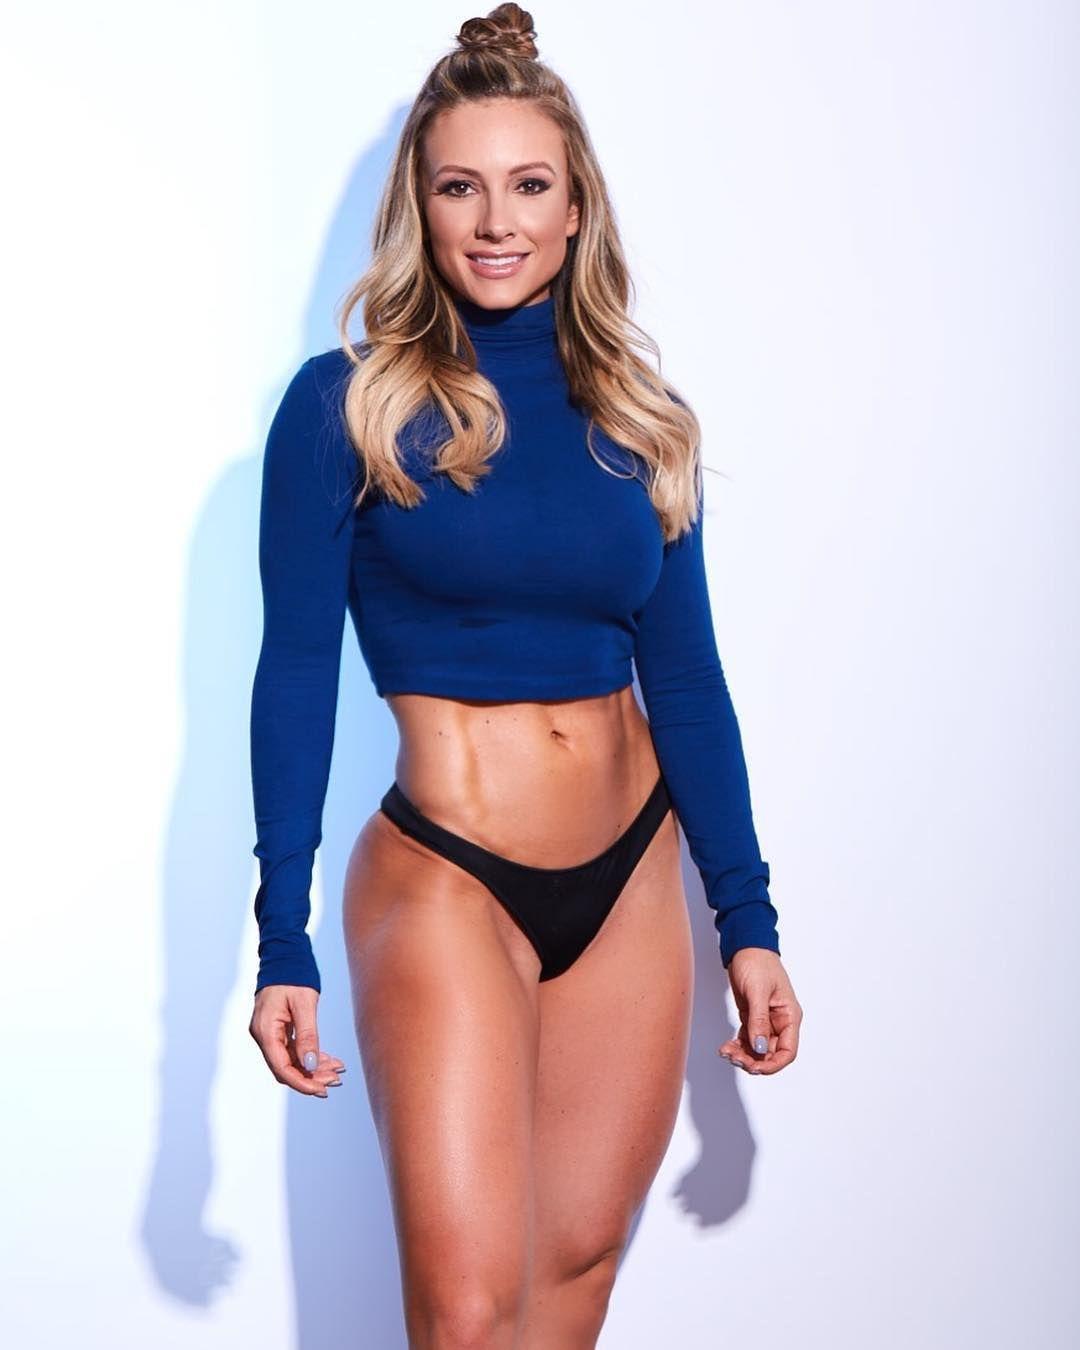 Fitness models pics nude